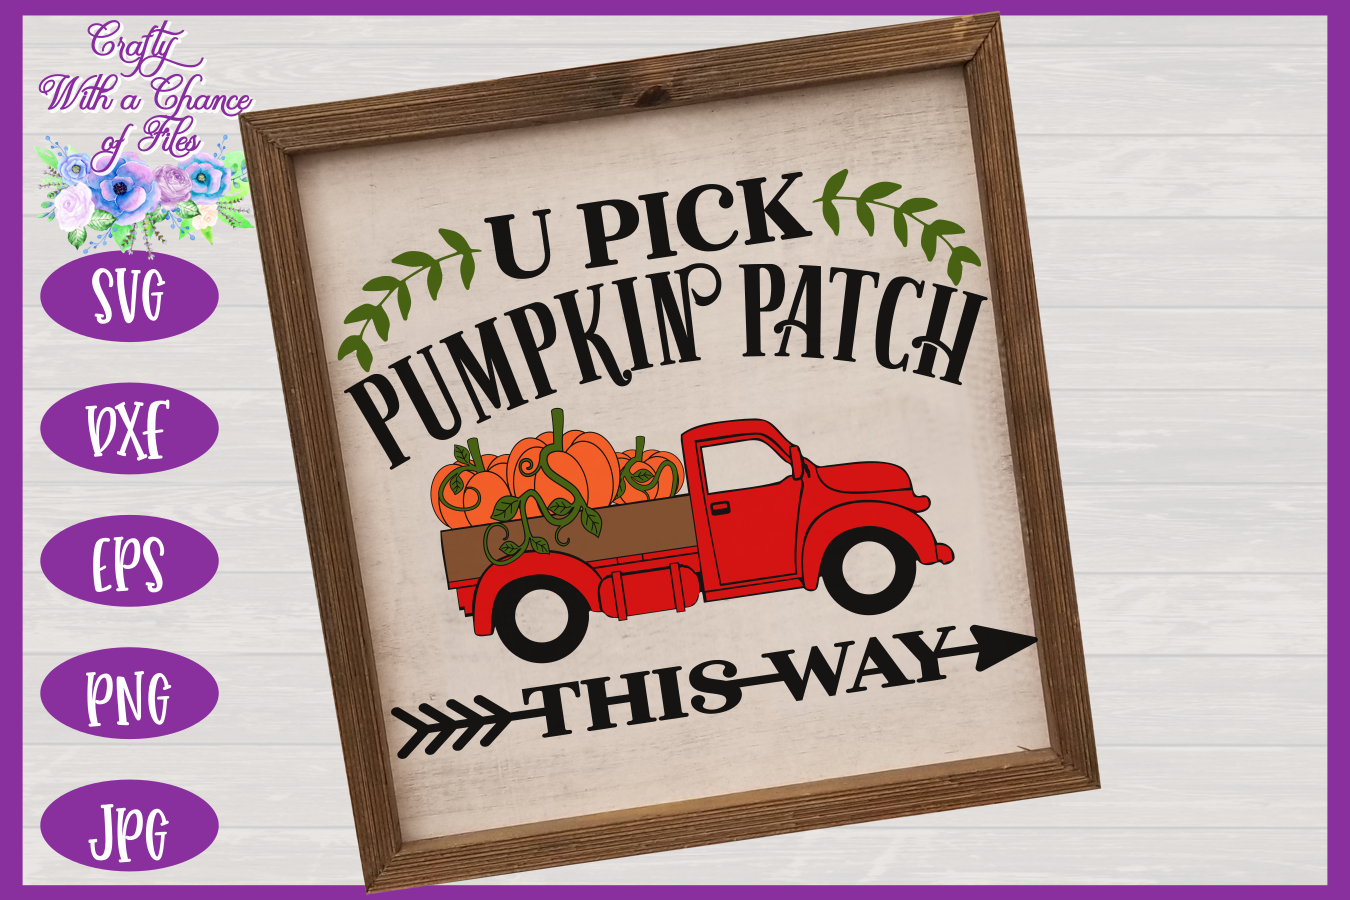 U Pick Pumpkins SVG | Fall Truck SVG | Pumpkin Patch SVG example image 2